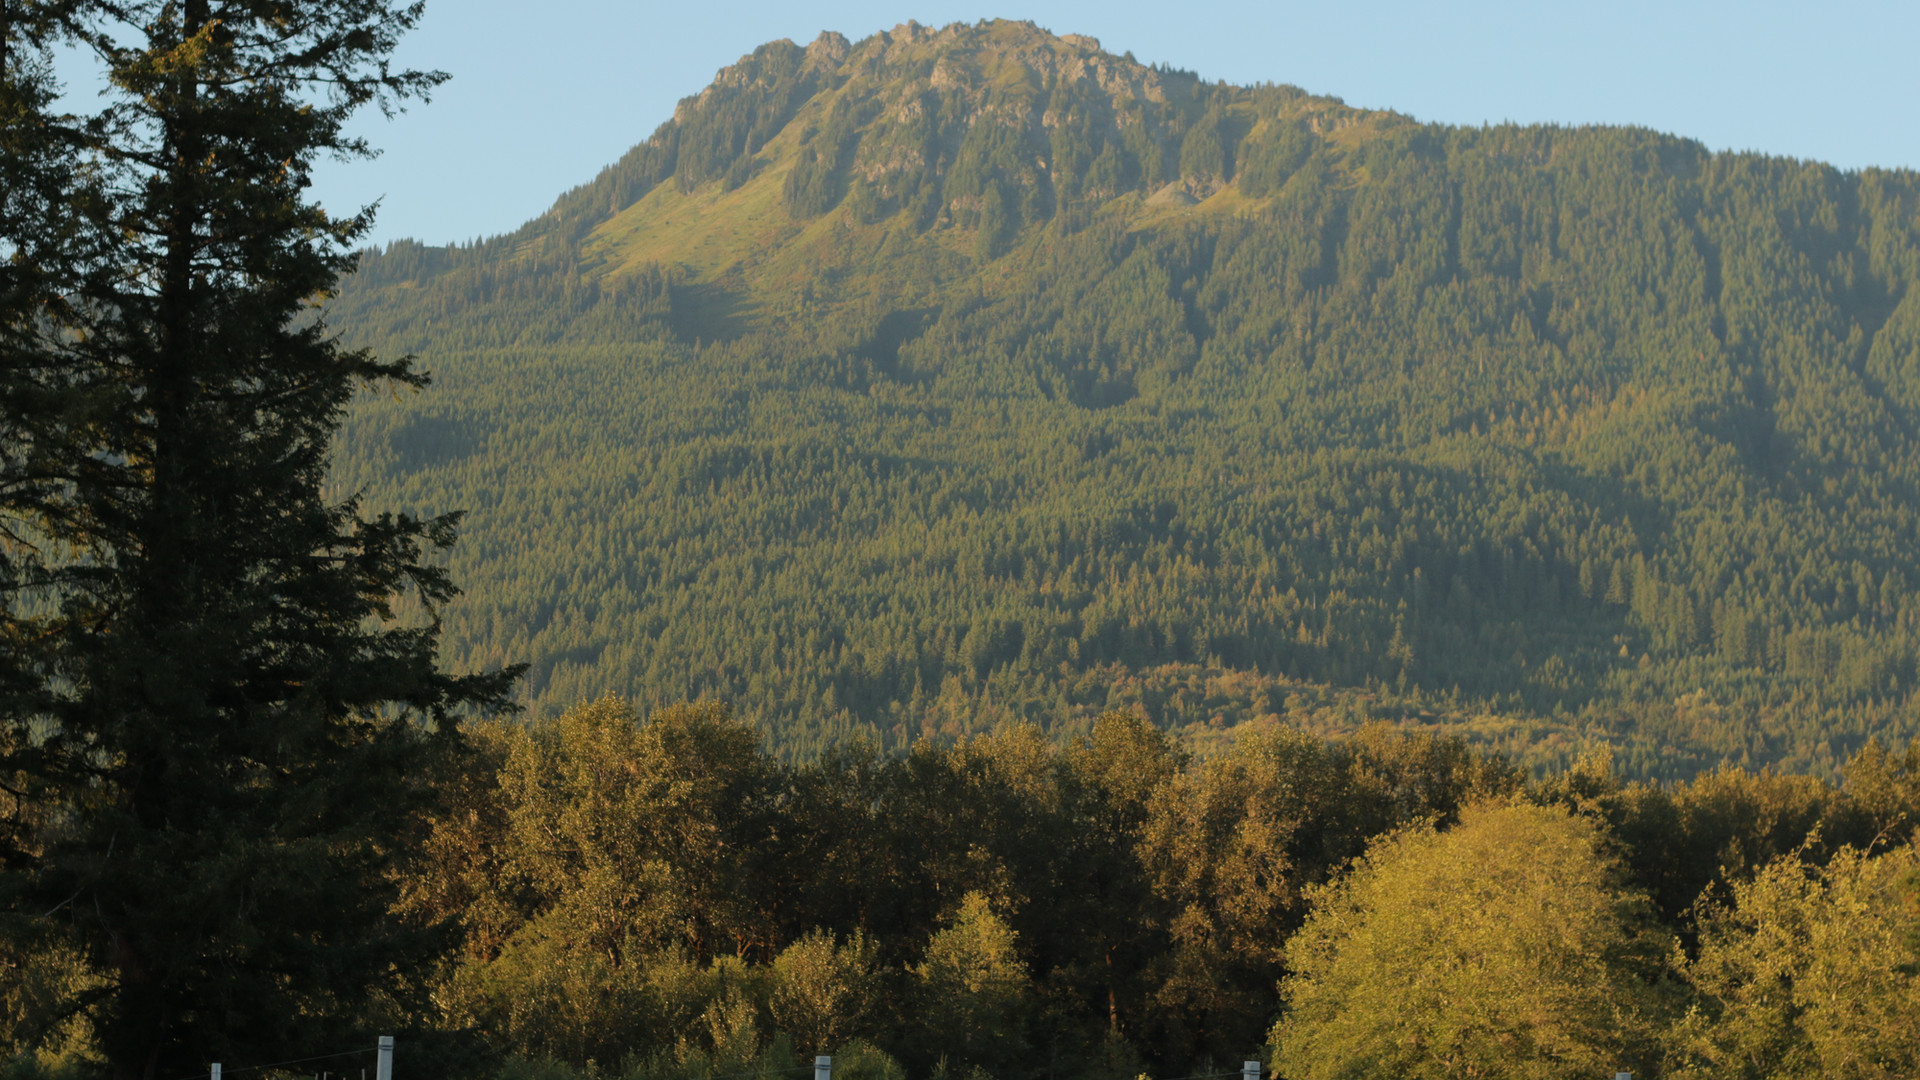 Sauk Mountain